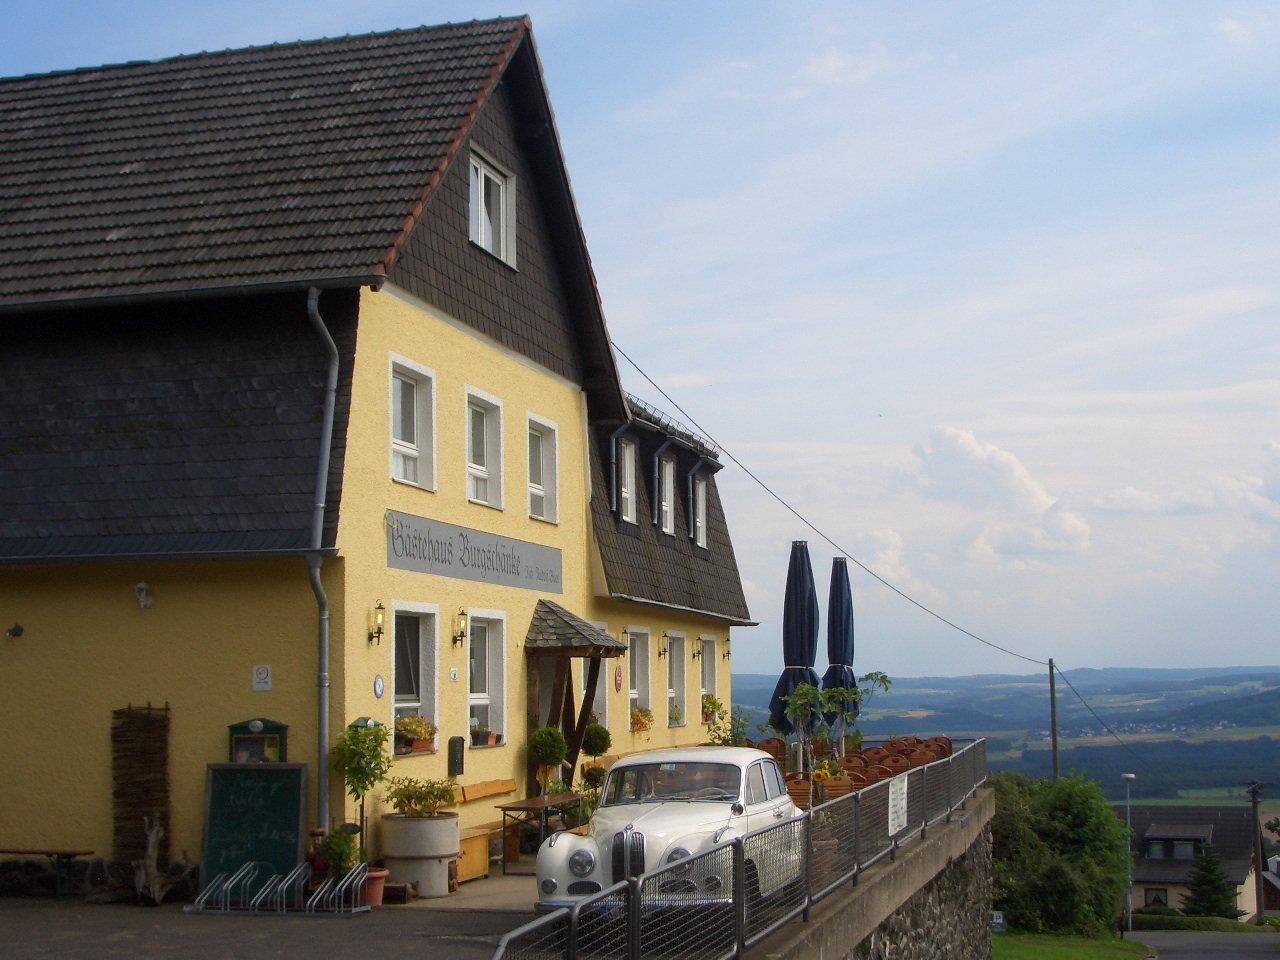 Hotel Burgschänke Aremberg – HOTEL DE